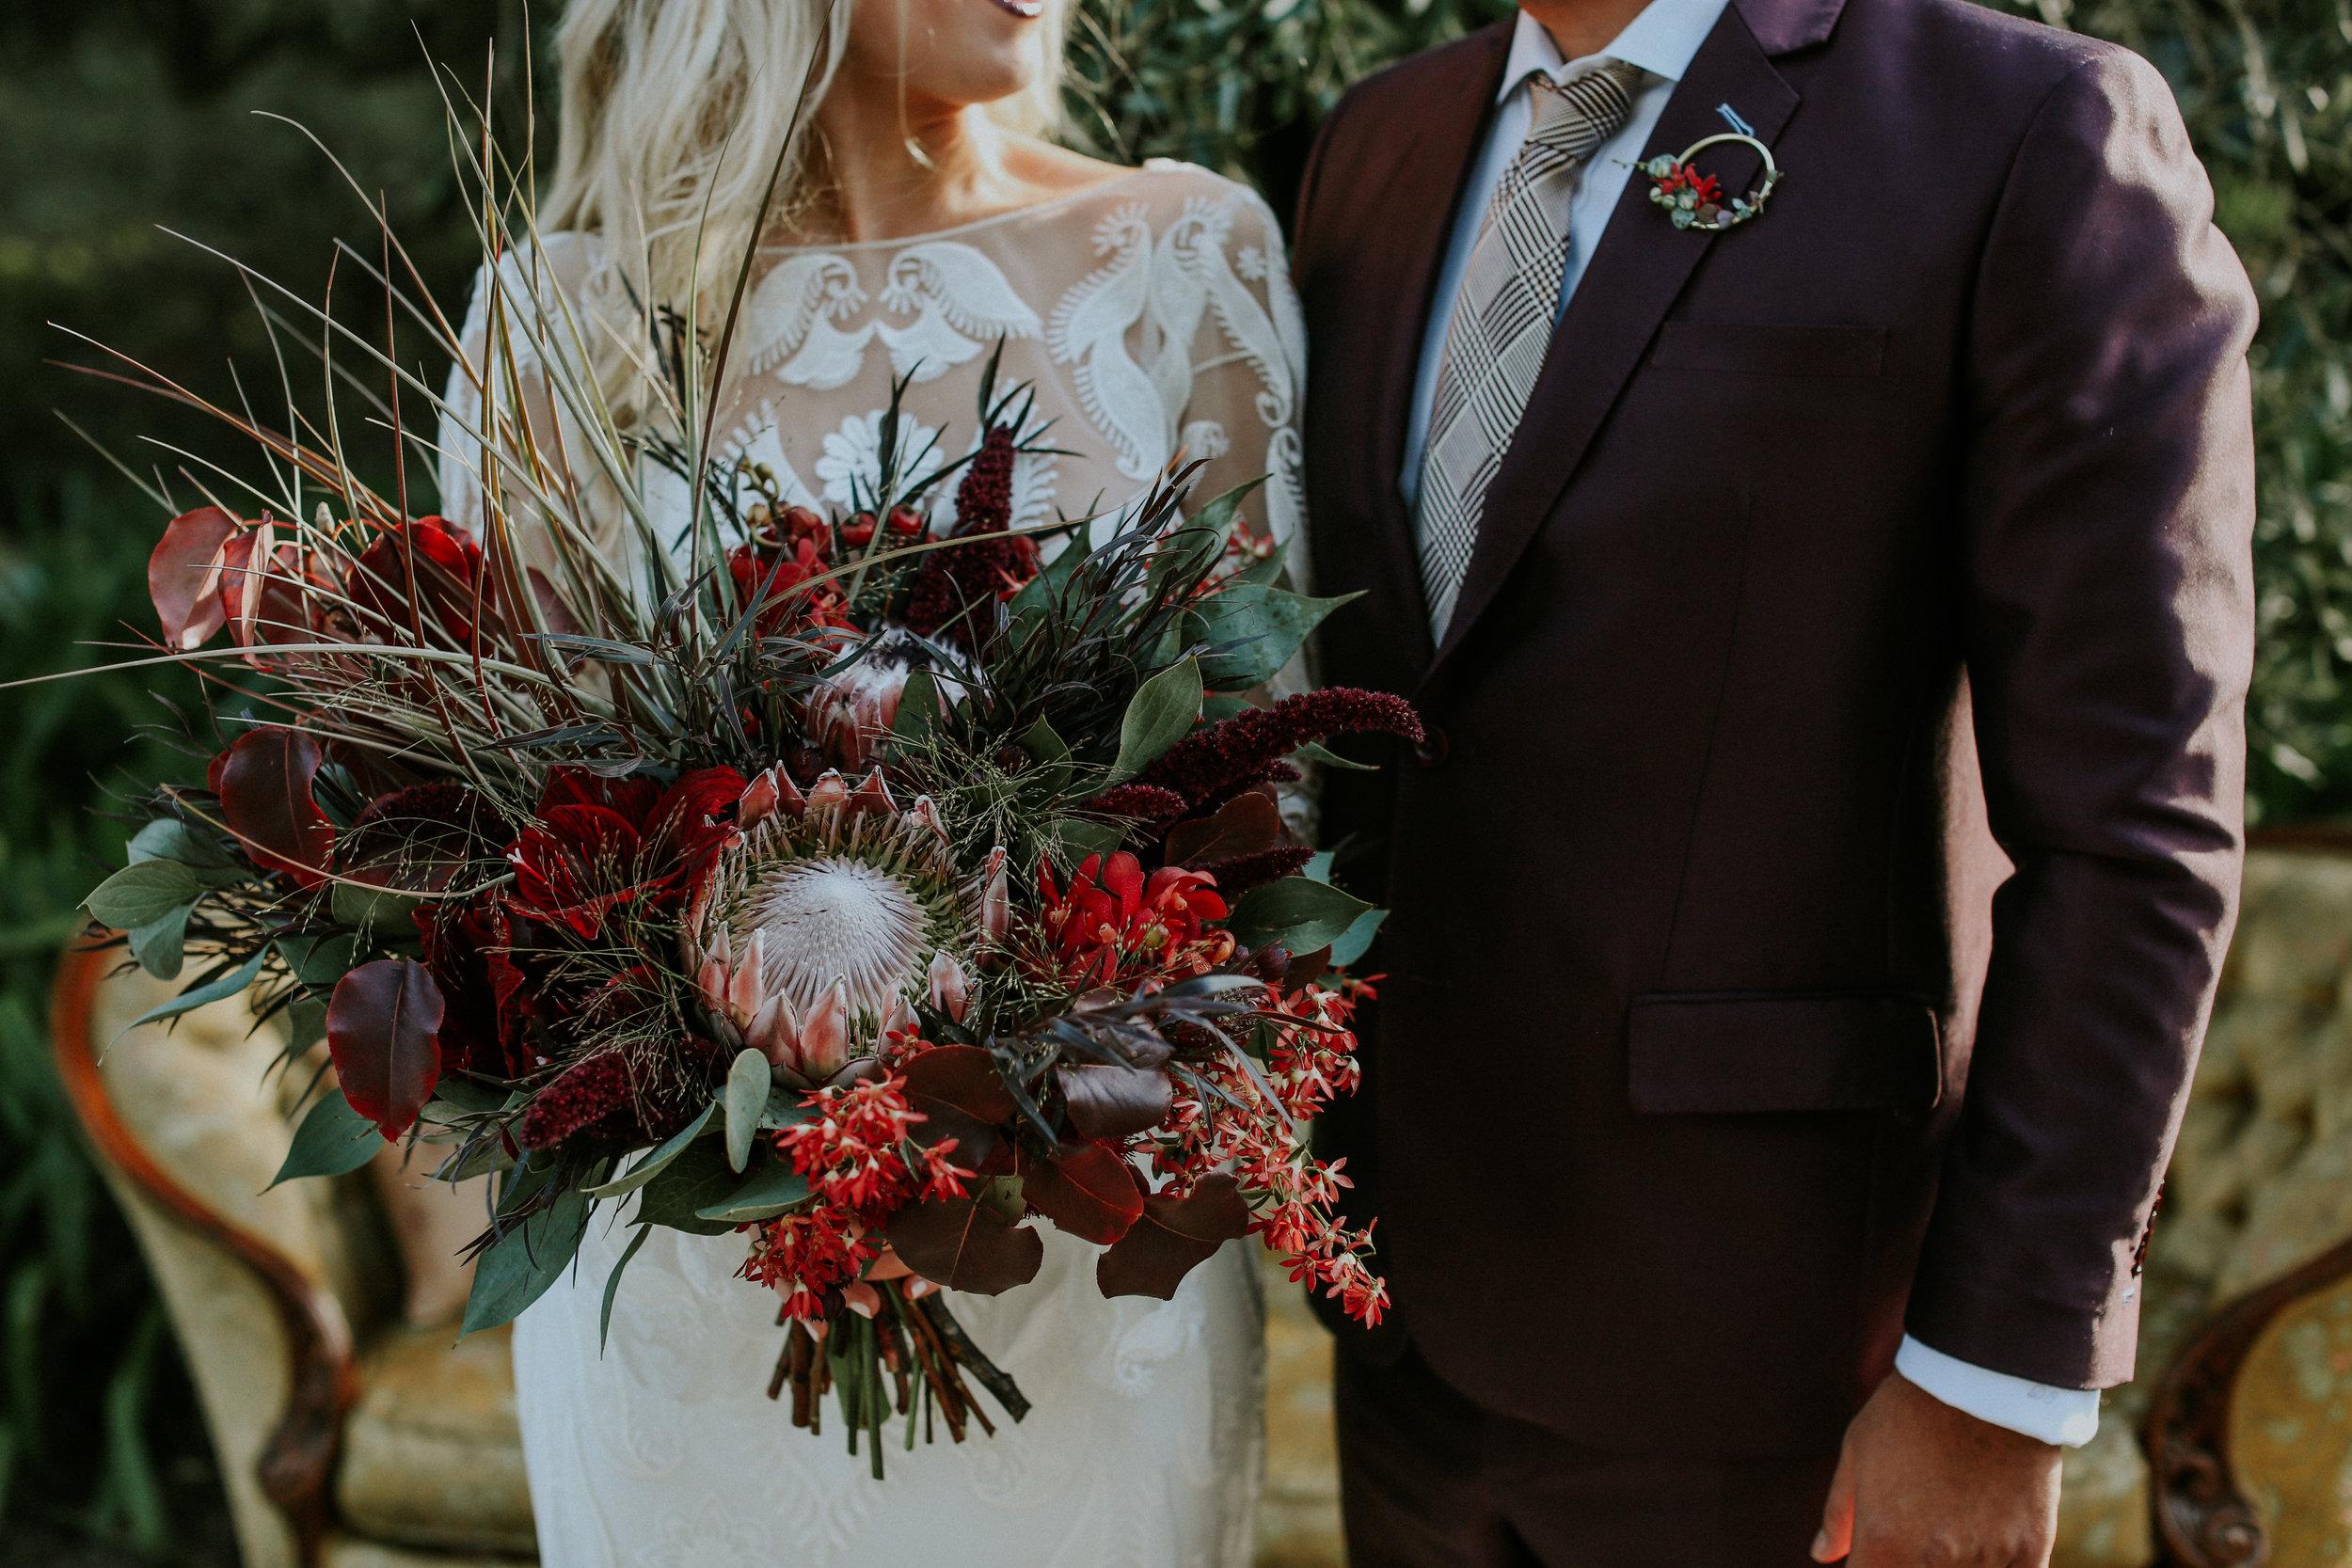 g4-estate-wedding-kimberly-macdonald-photography277A3575.jpg